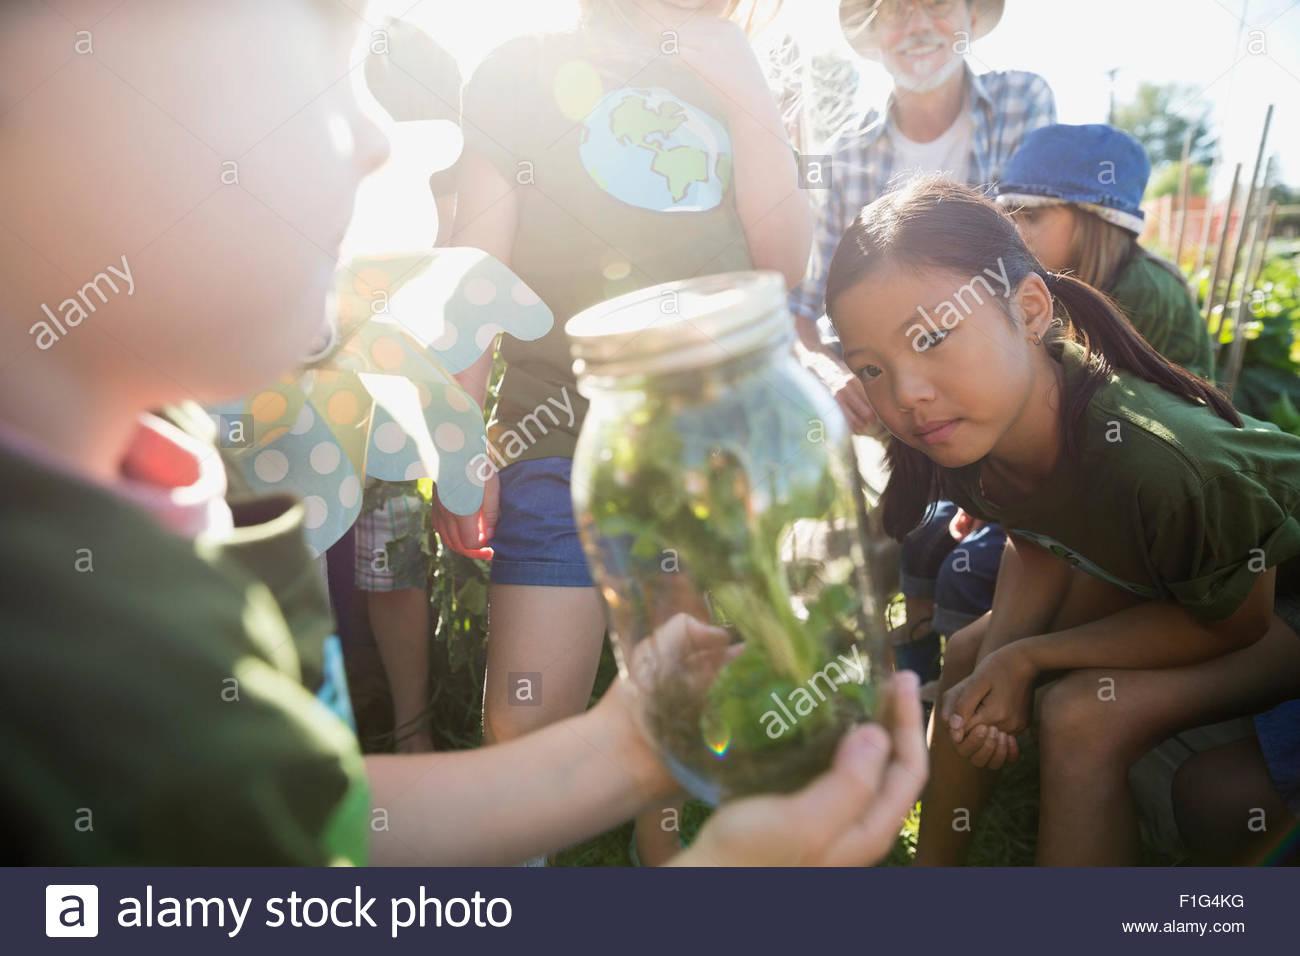 Kids examining plant in jar in sunny garden - Stock Image